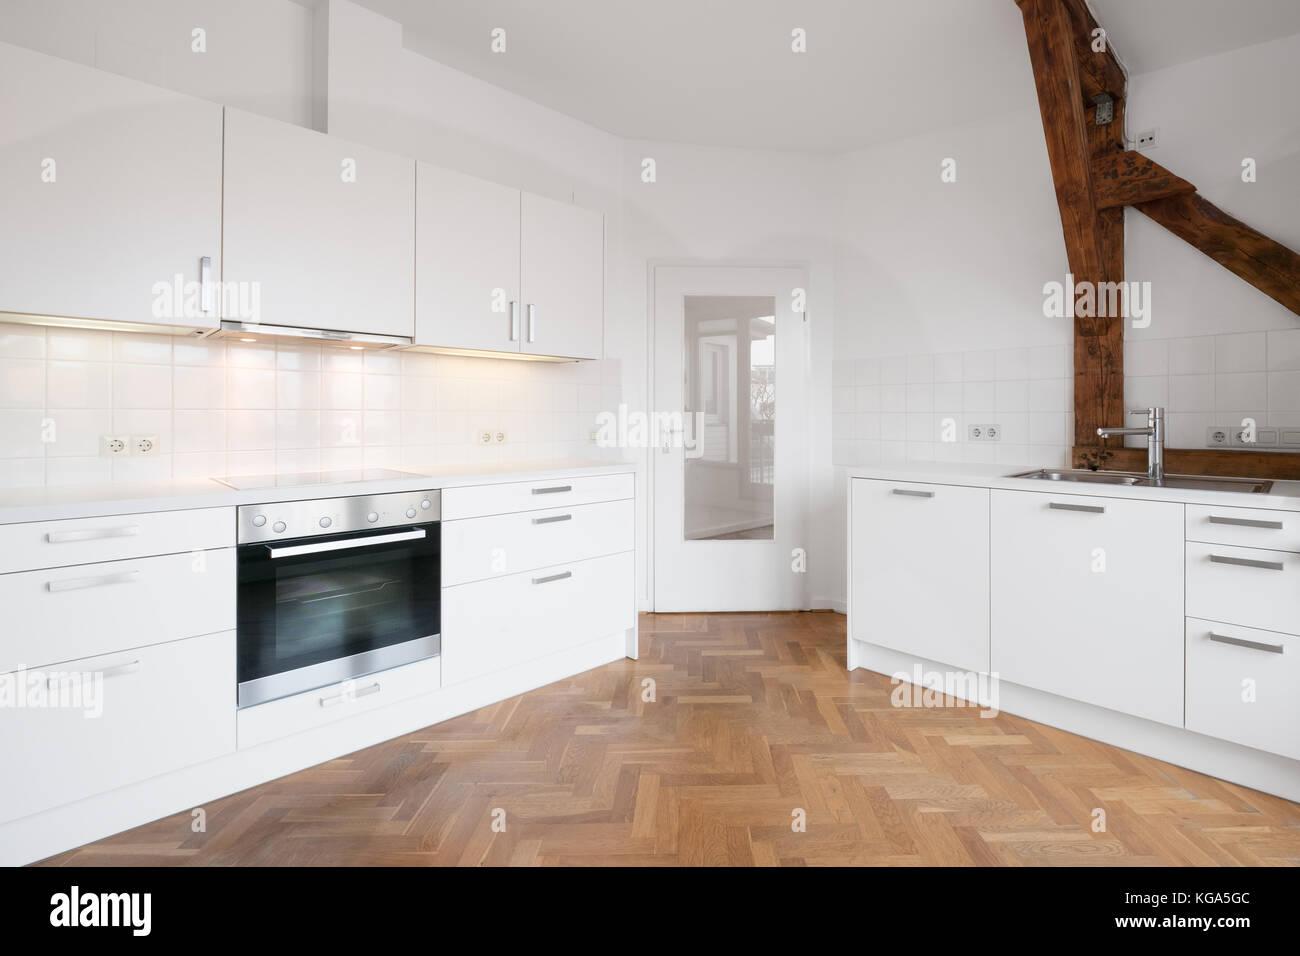 Pavimento cucina bianca affordable pavimento per cucina bianca piastrelle moderna le migliori for Placcaggio cucina moderna